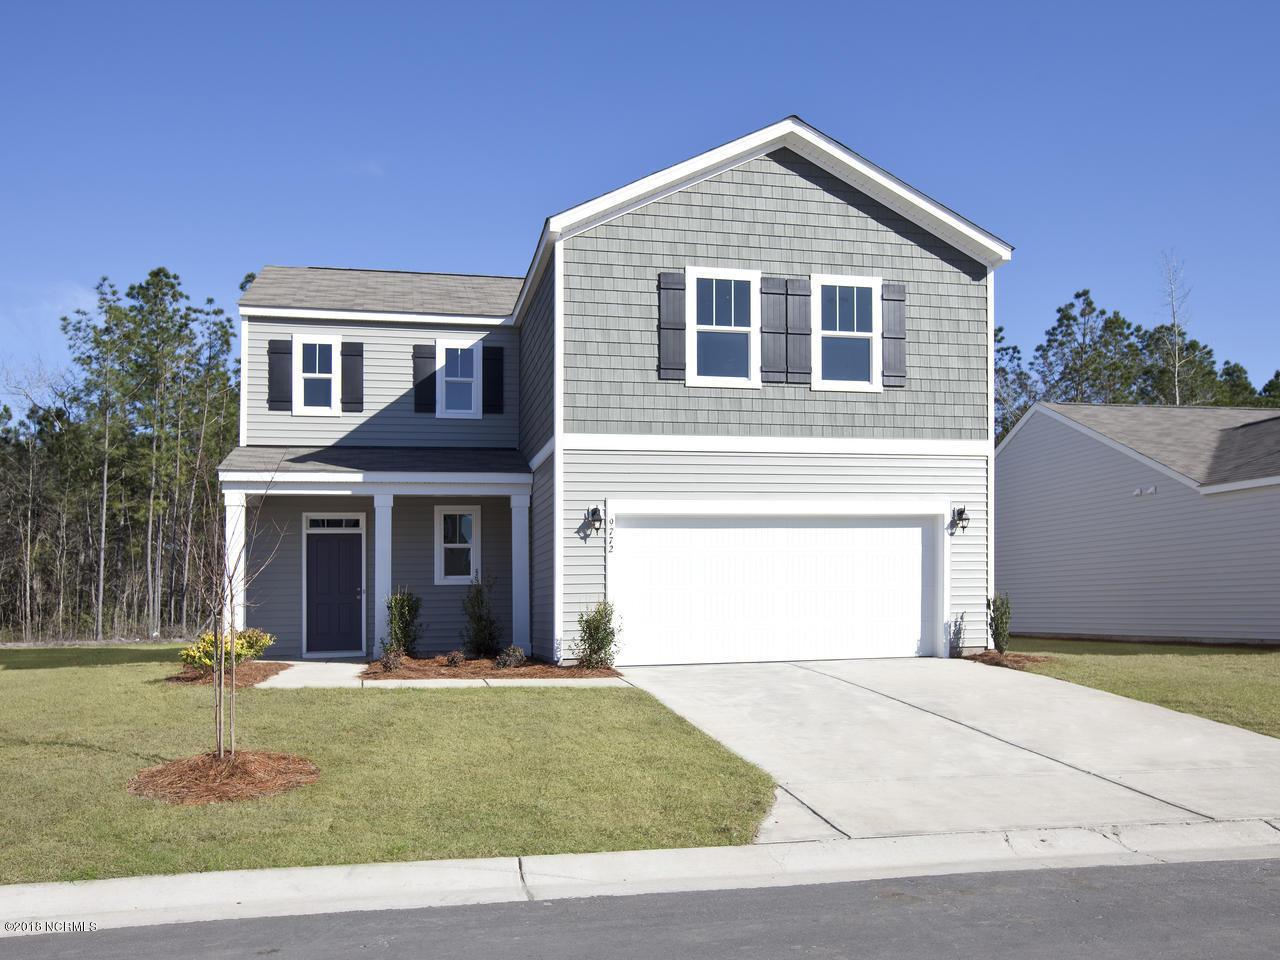 9724 Woodriff Circle #lot 75 Leland, NC 28451